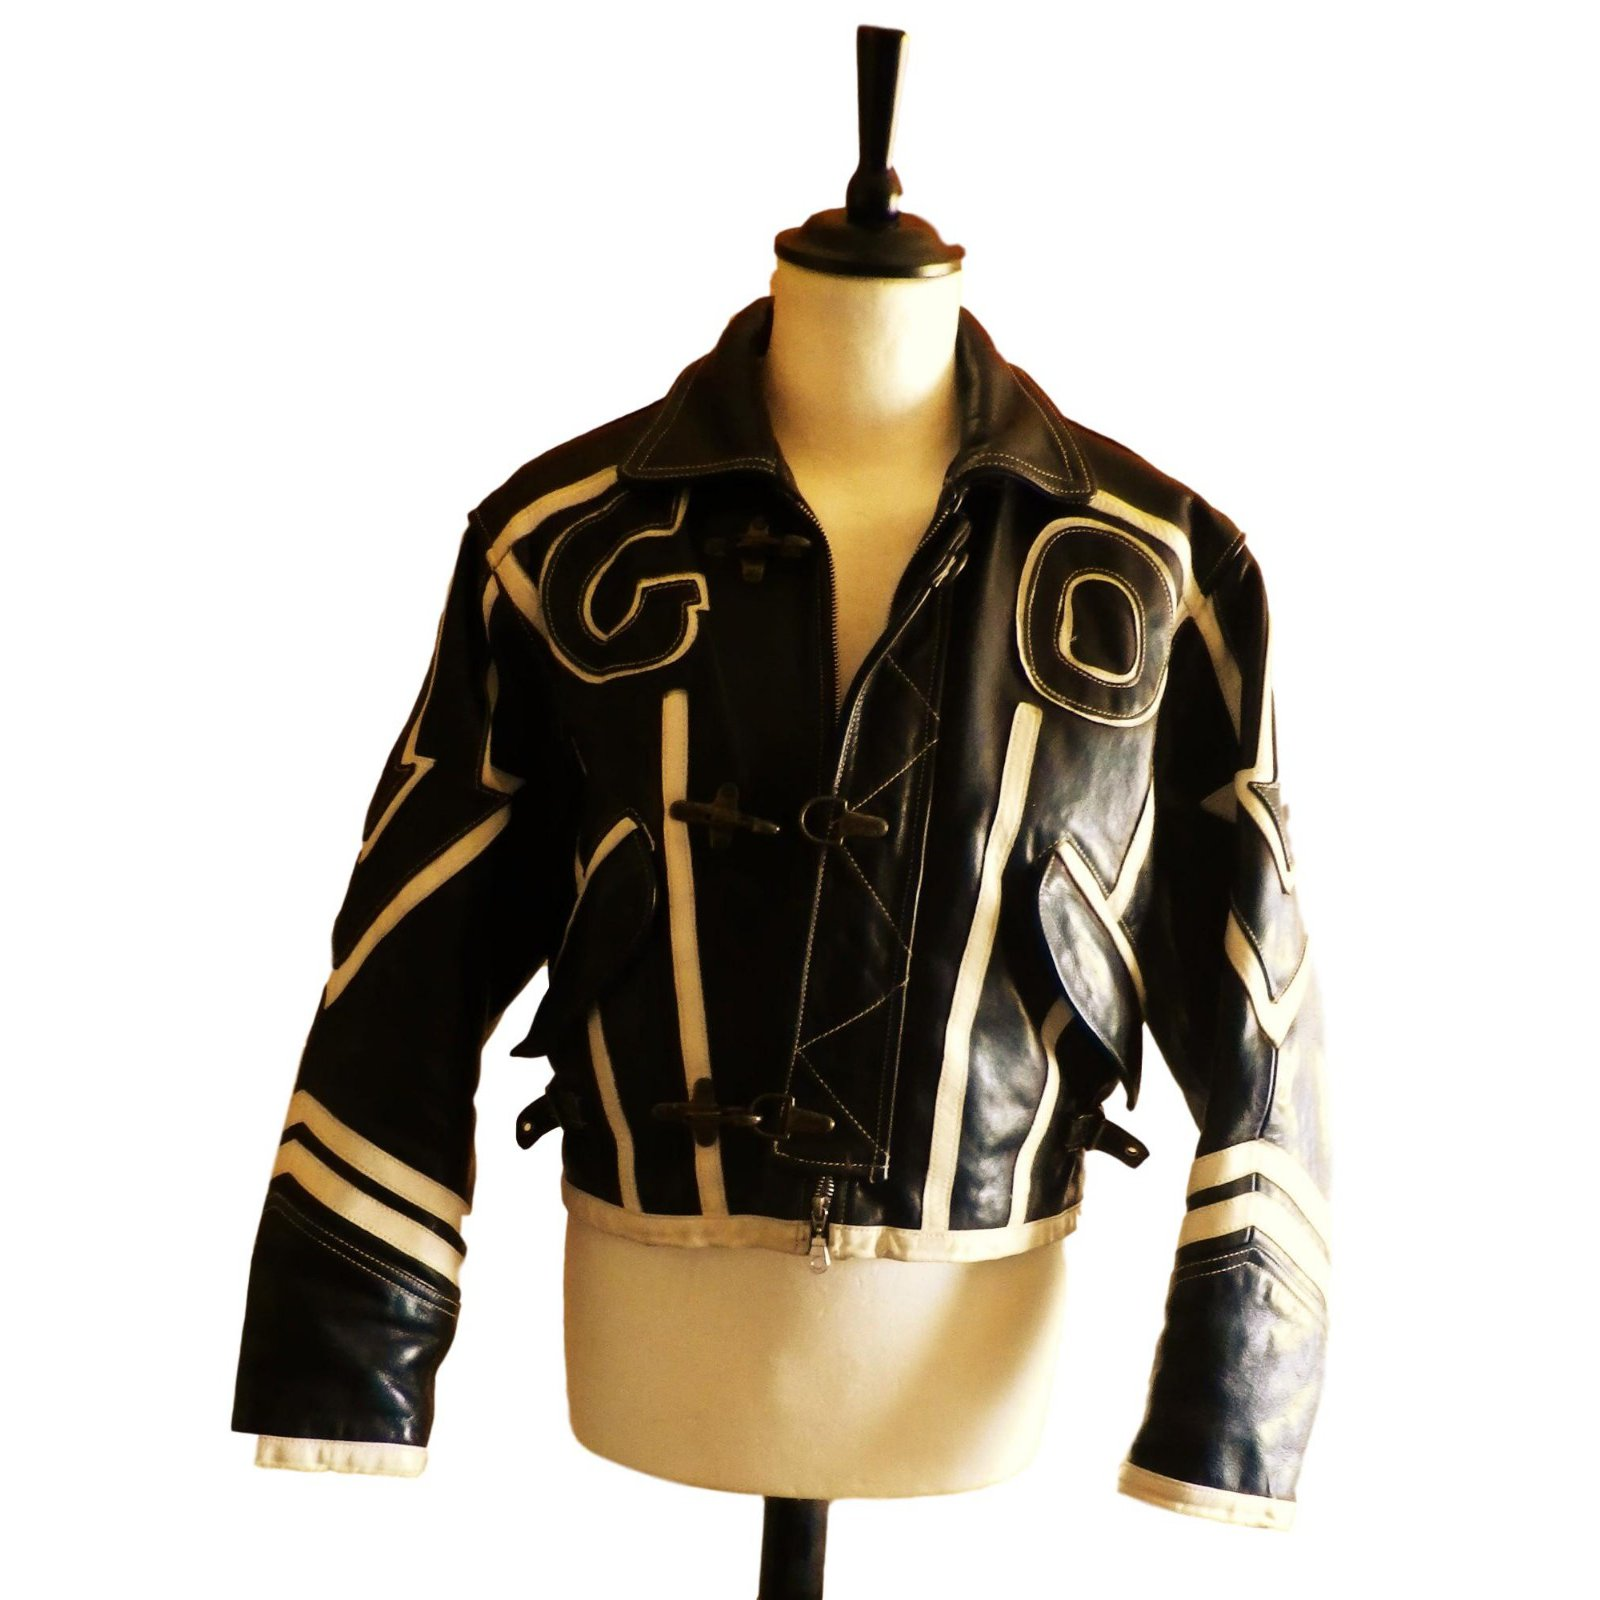 84a1f85c156b Vestes, blousons Giorgio blouson de moto Cuir Noir ref.83106 - Joli ...